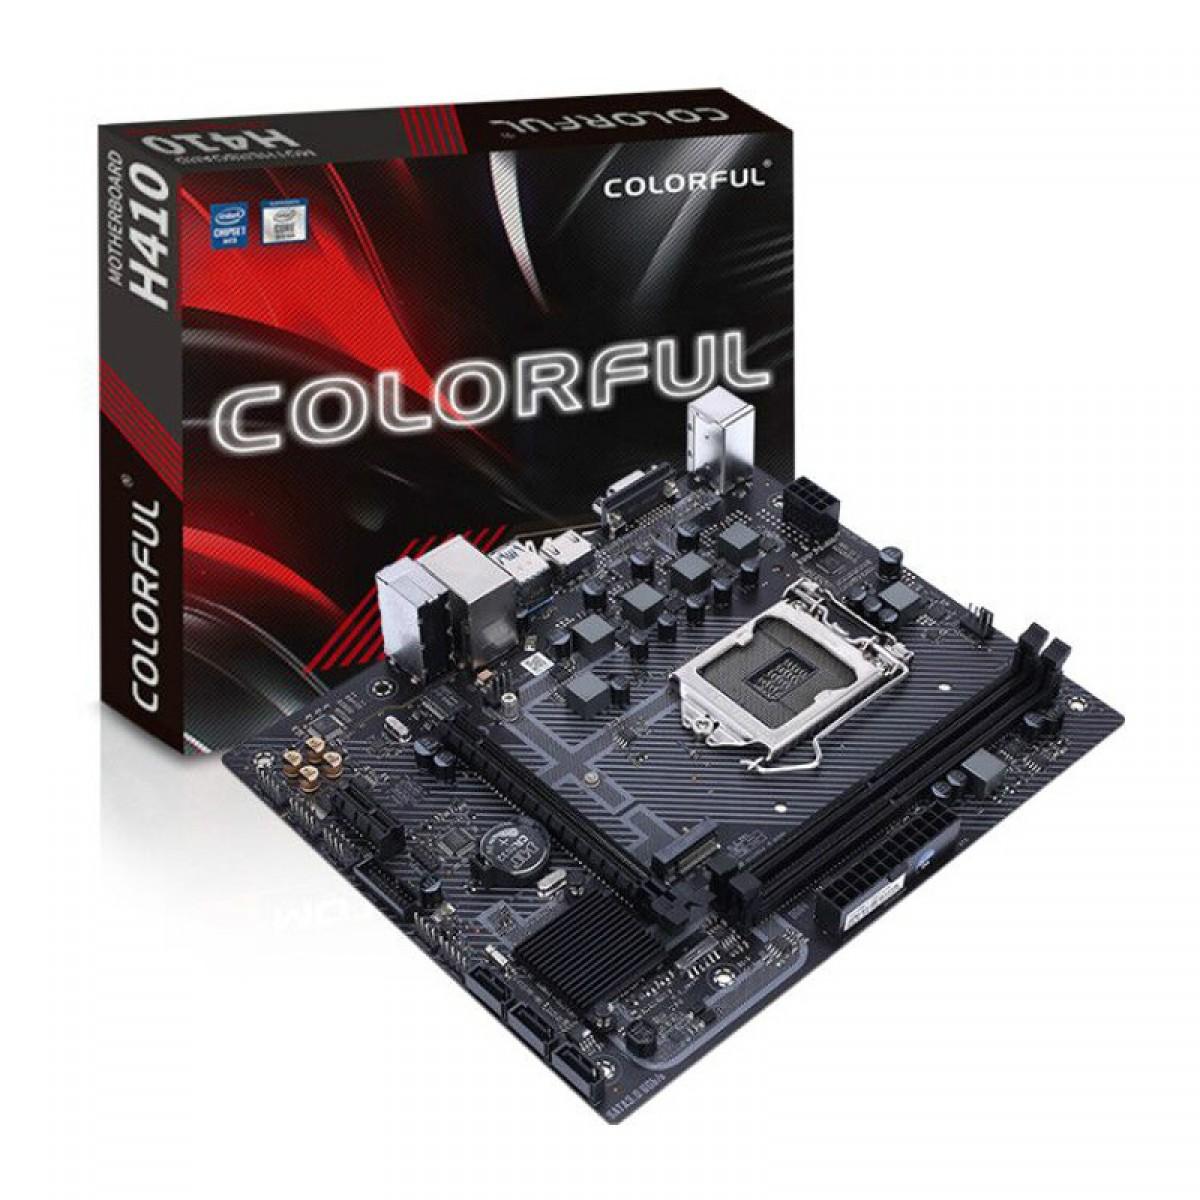 Placa Mãe Colorful H410M-T PRO V20, Chipset H410, Intel LGA 1200, mATX, DDR4